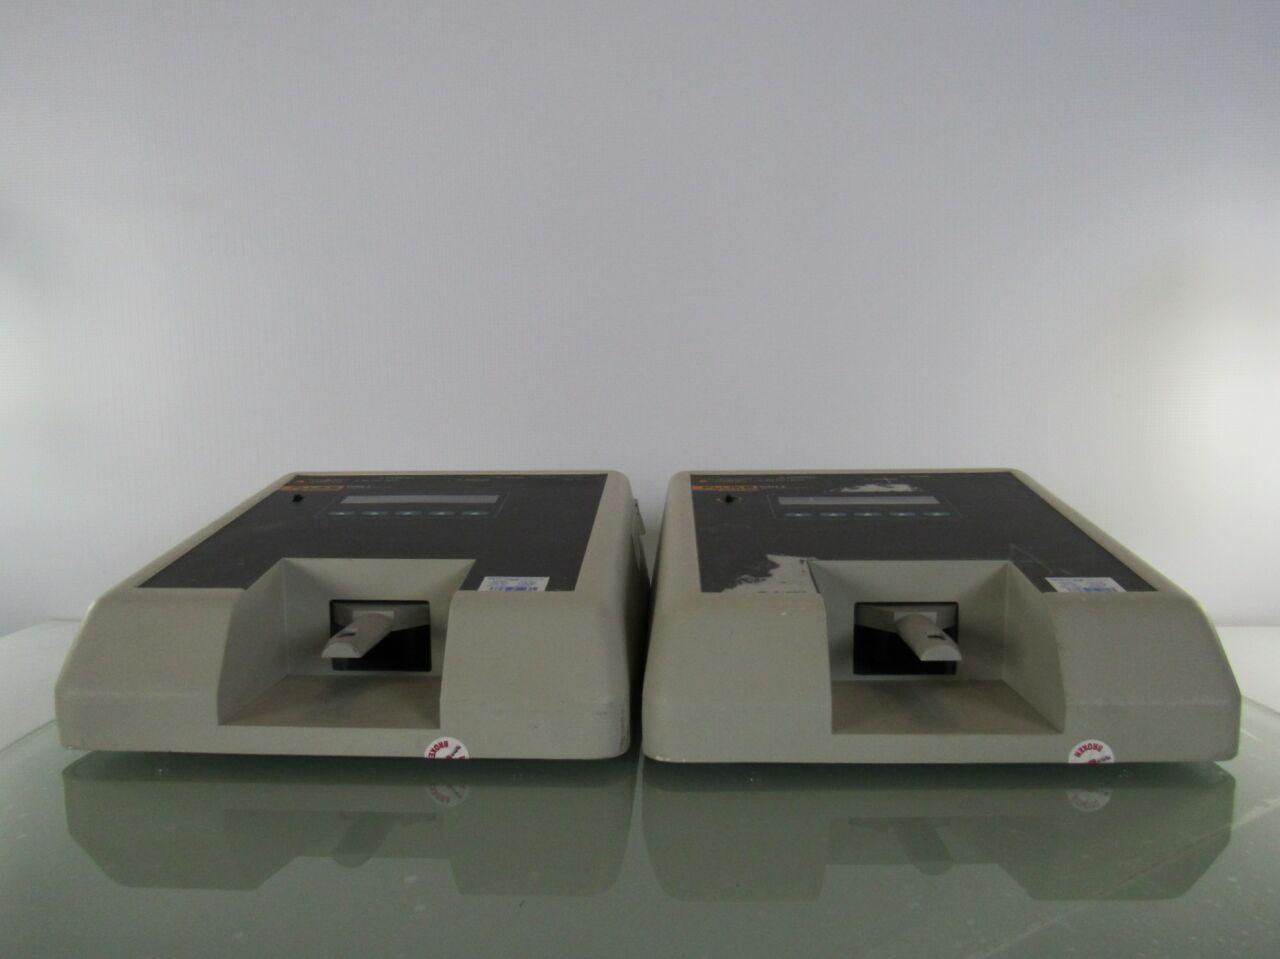 FLUKE Index 2 SPO2   - Lot of 2 Simulator